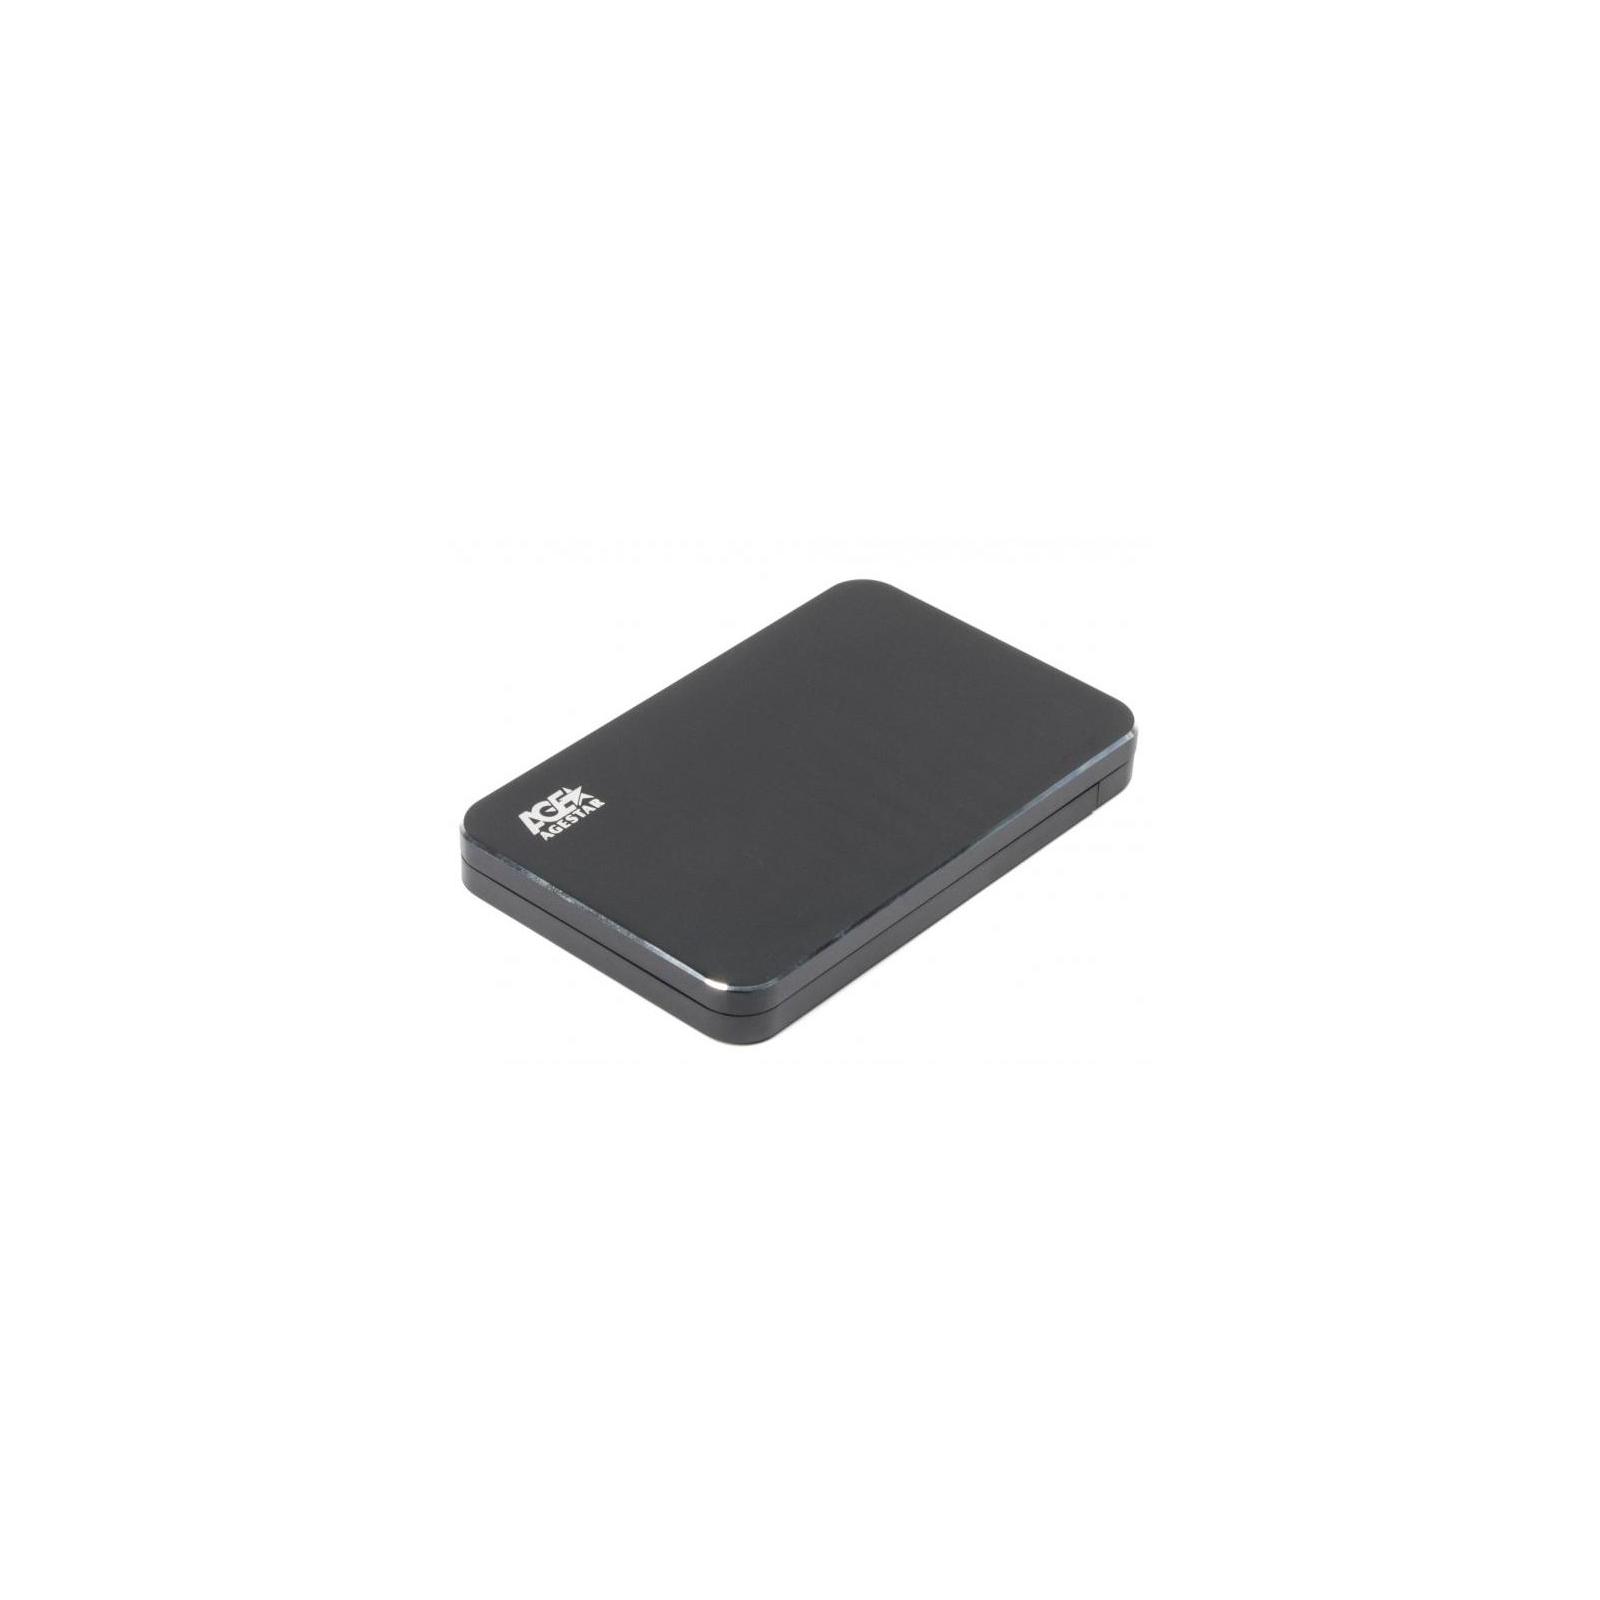 "Карман внешний AgeStar 2.5"", USB3.1, черный (31UB2A18 (Black))"